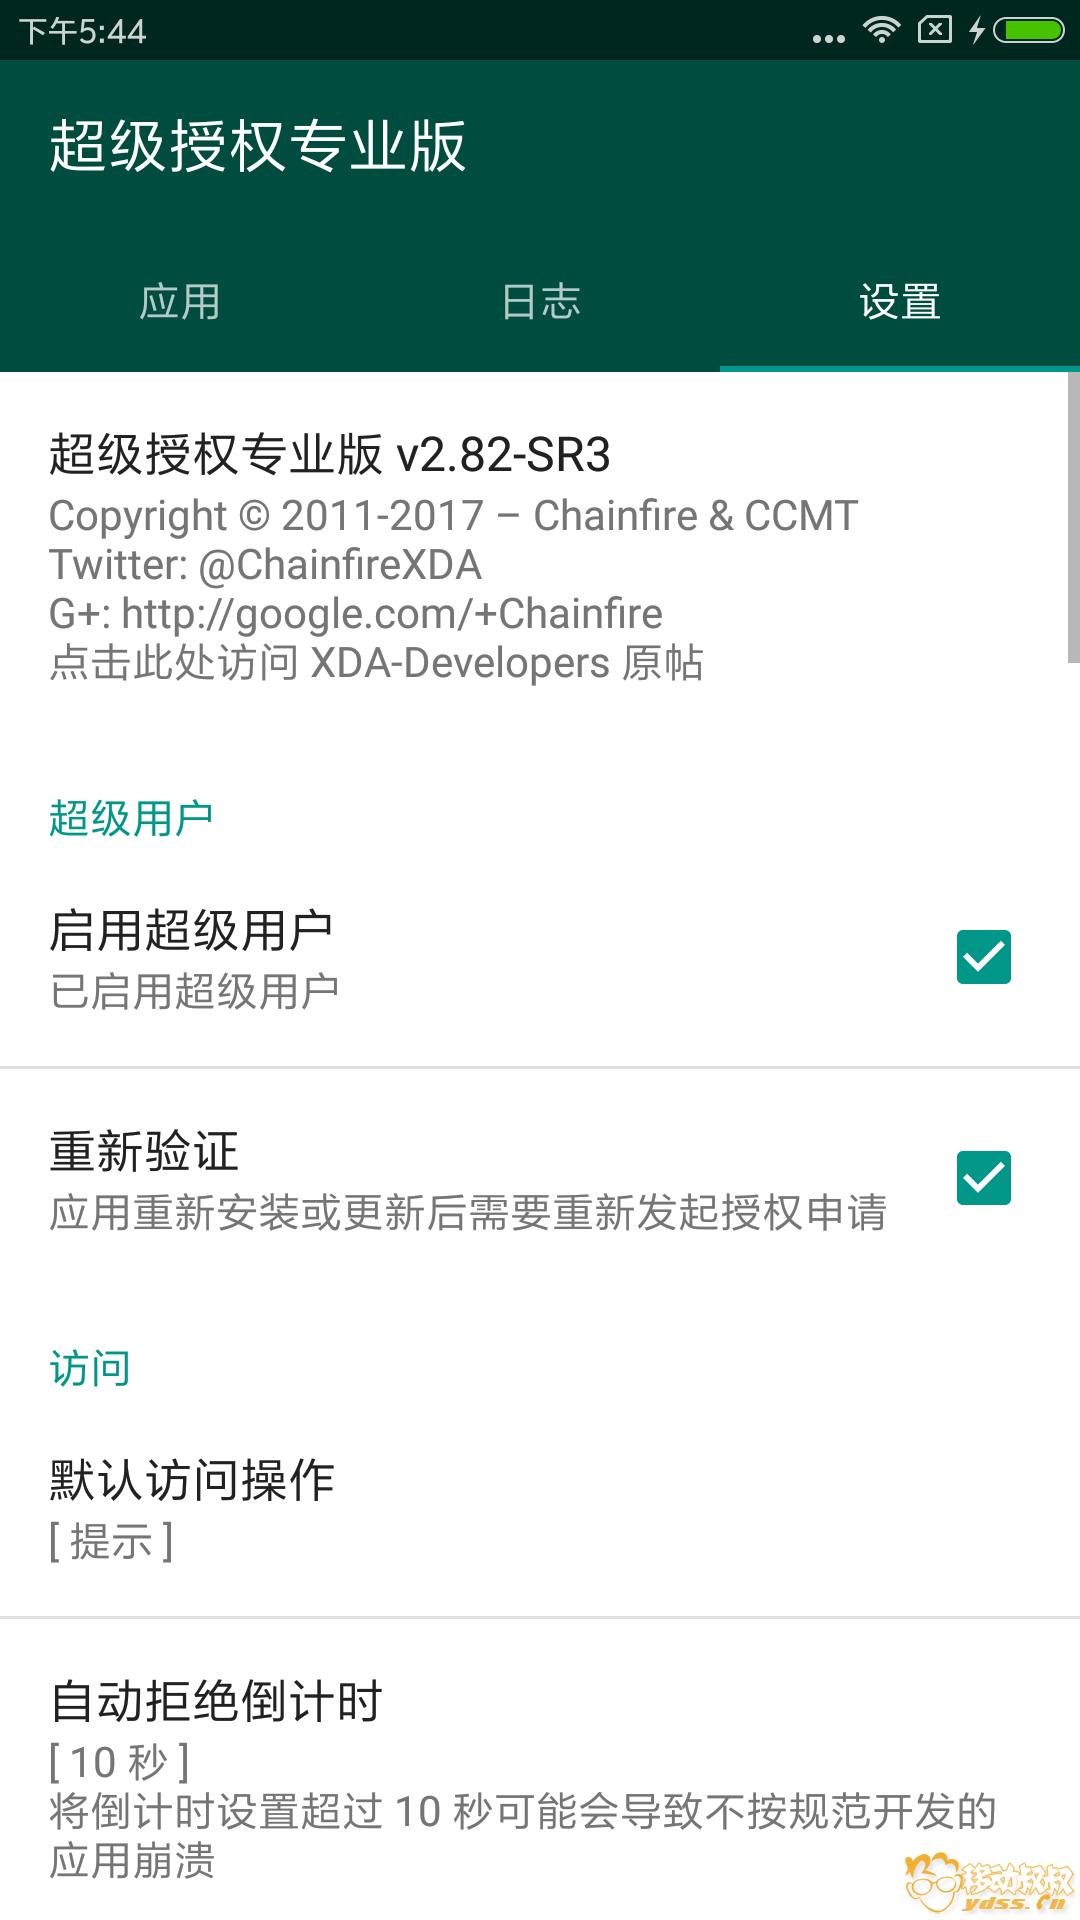 Screenshot_2018-03-23-17-44-11-574_eu.chainfire.supersu.png